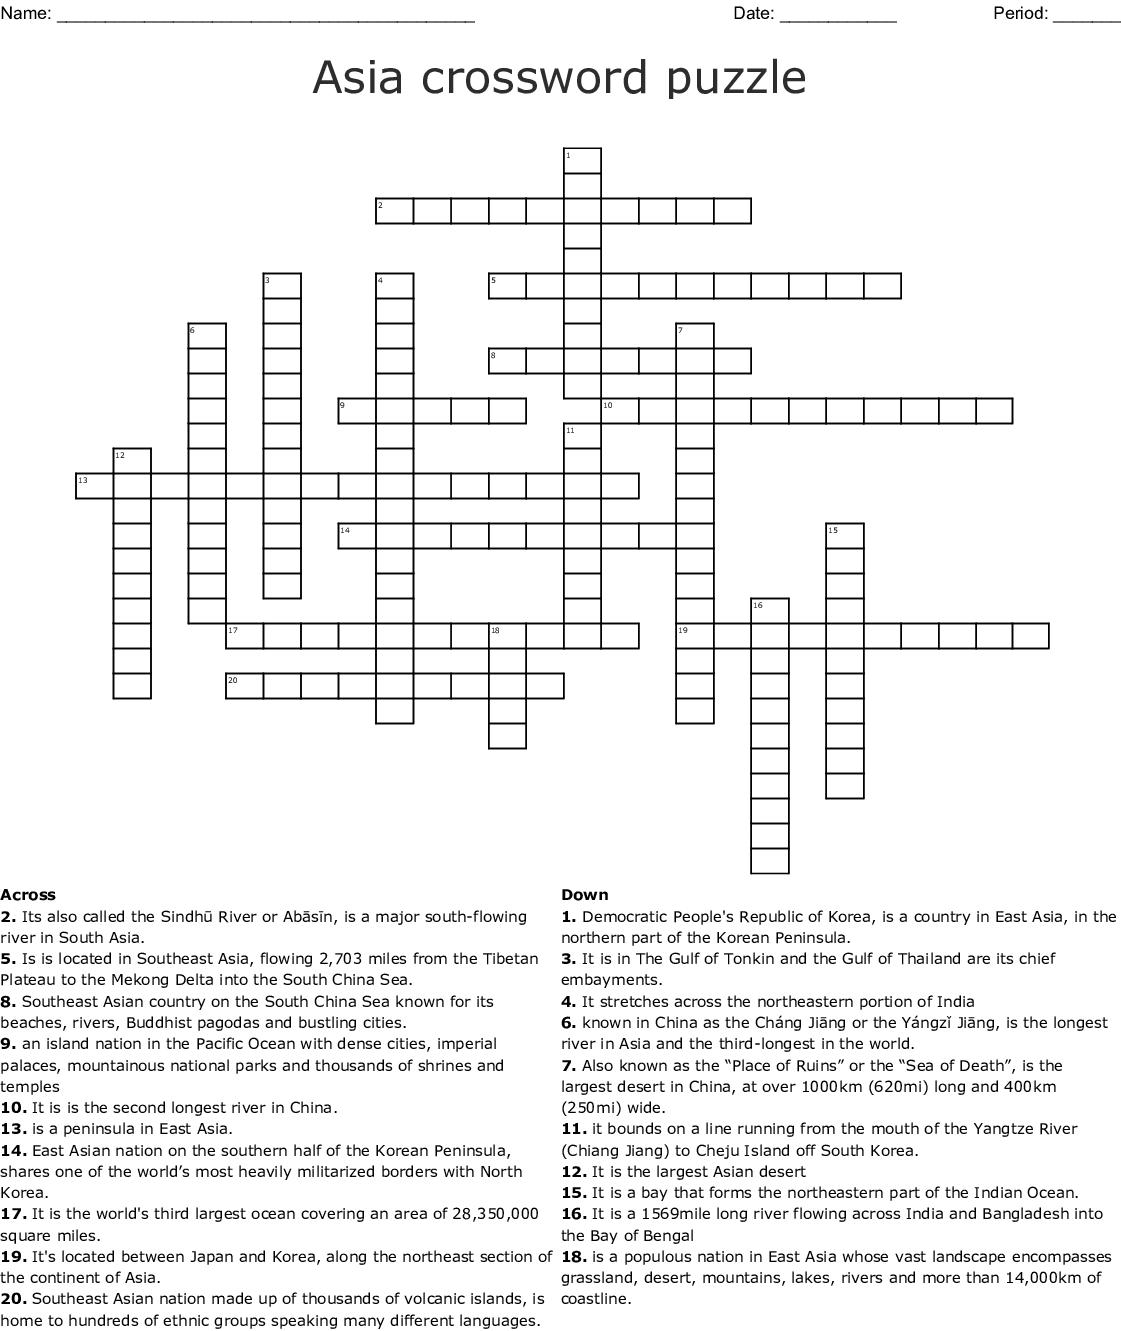 Island In The Mediterranean Sea Crossword Clue